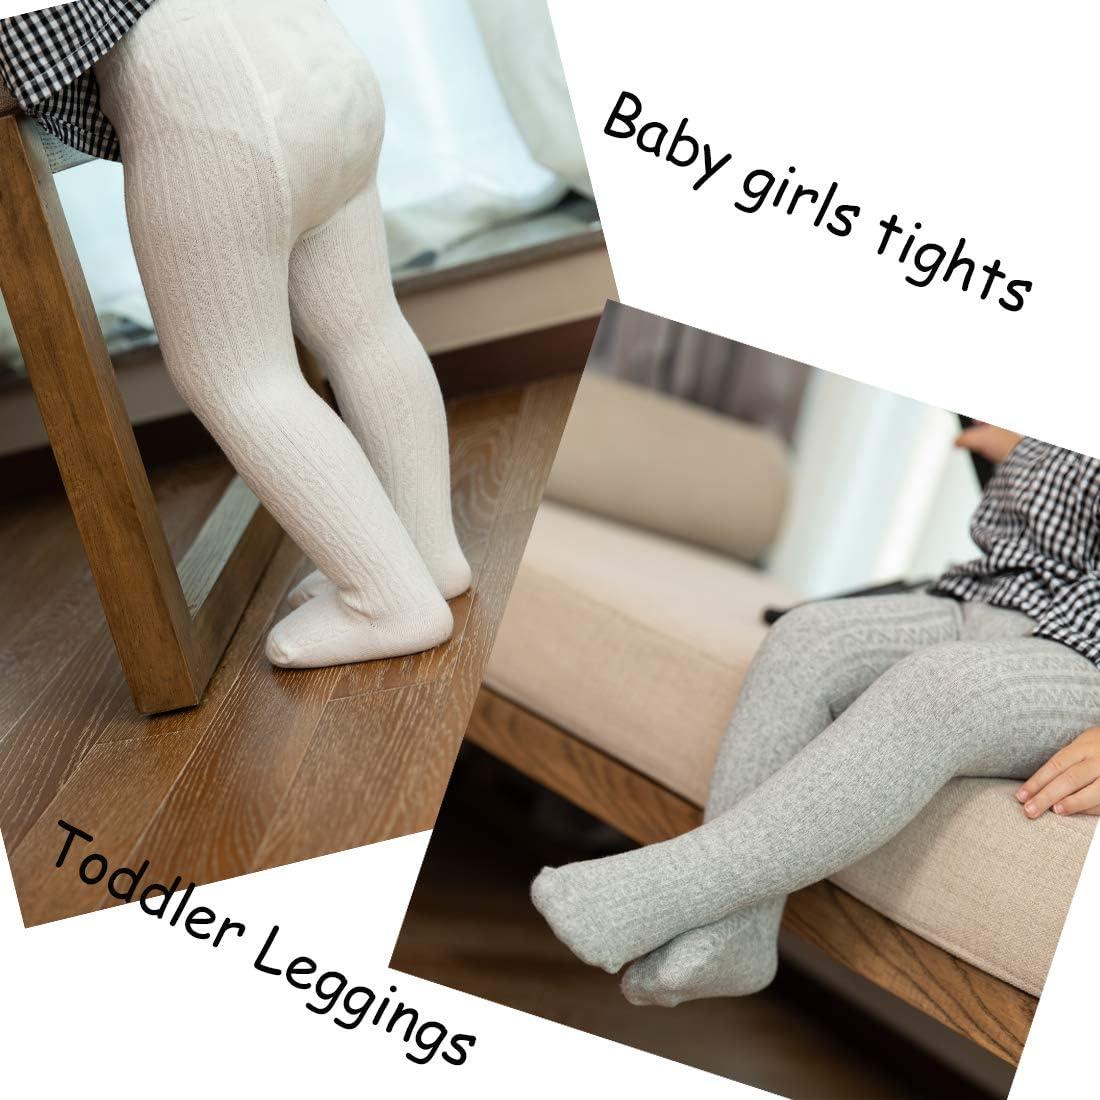 Teen feet pantyhose I Don't